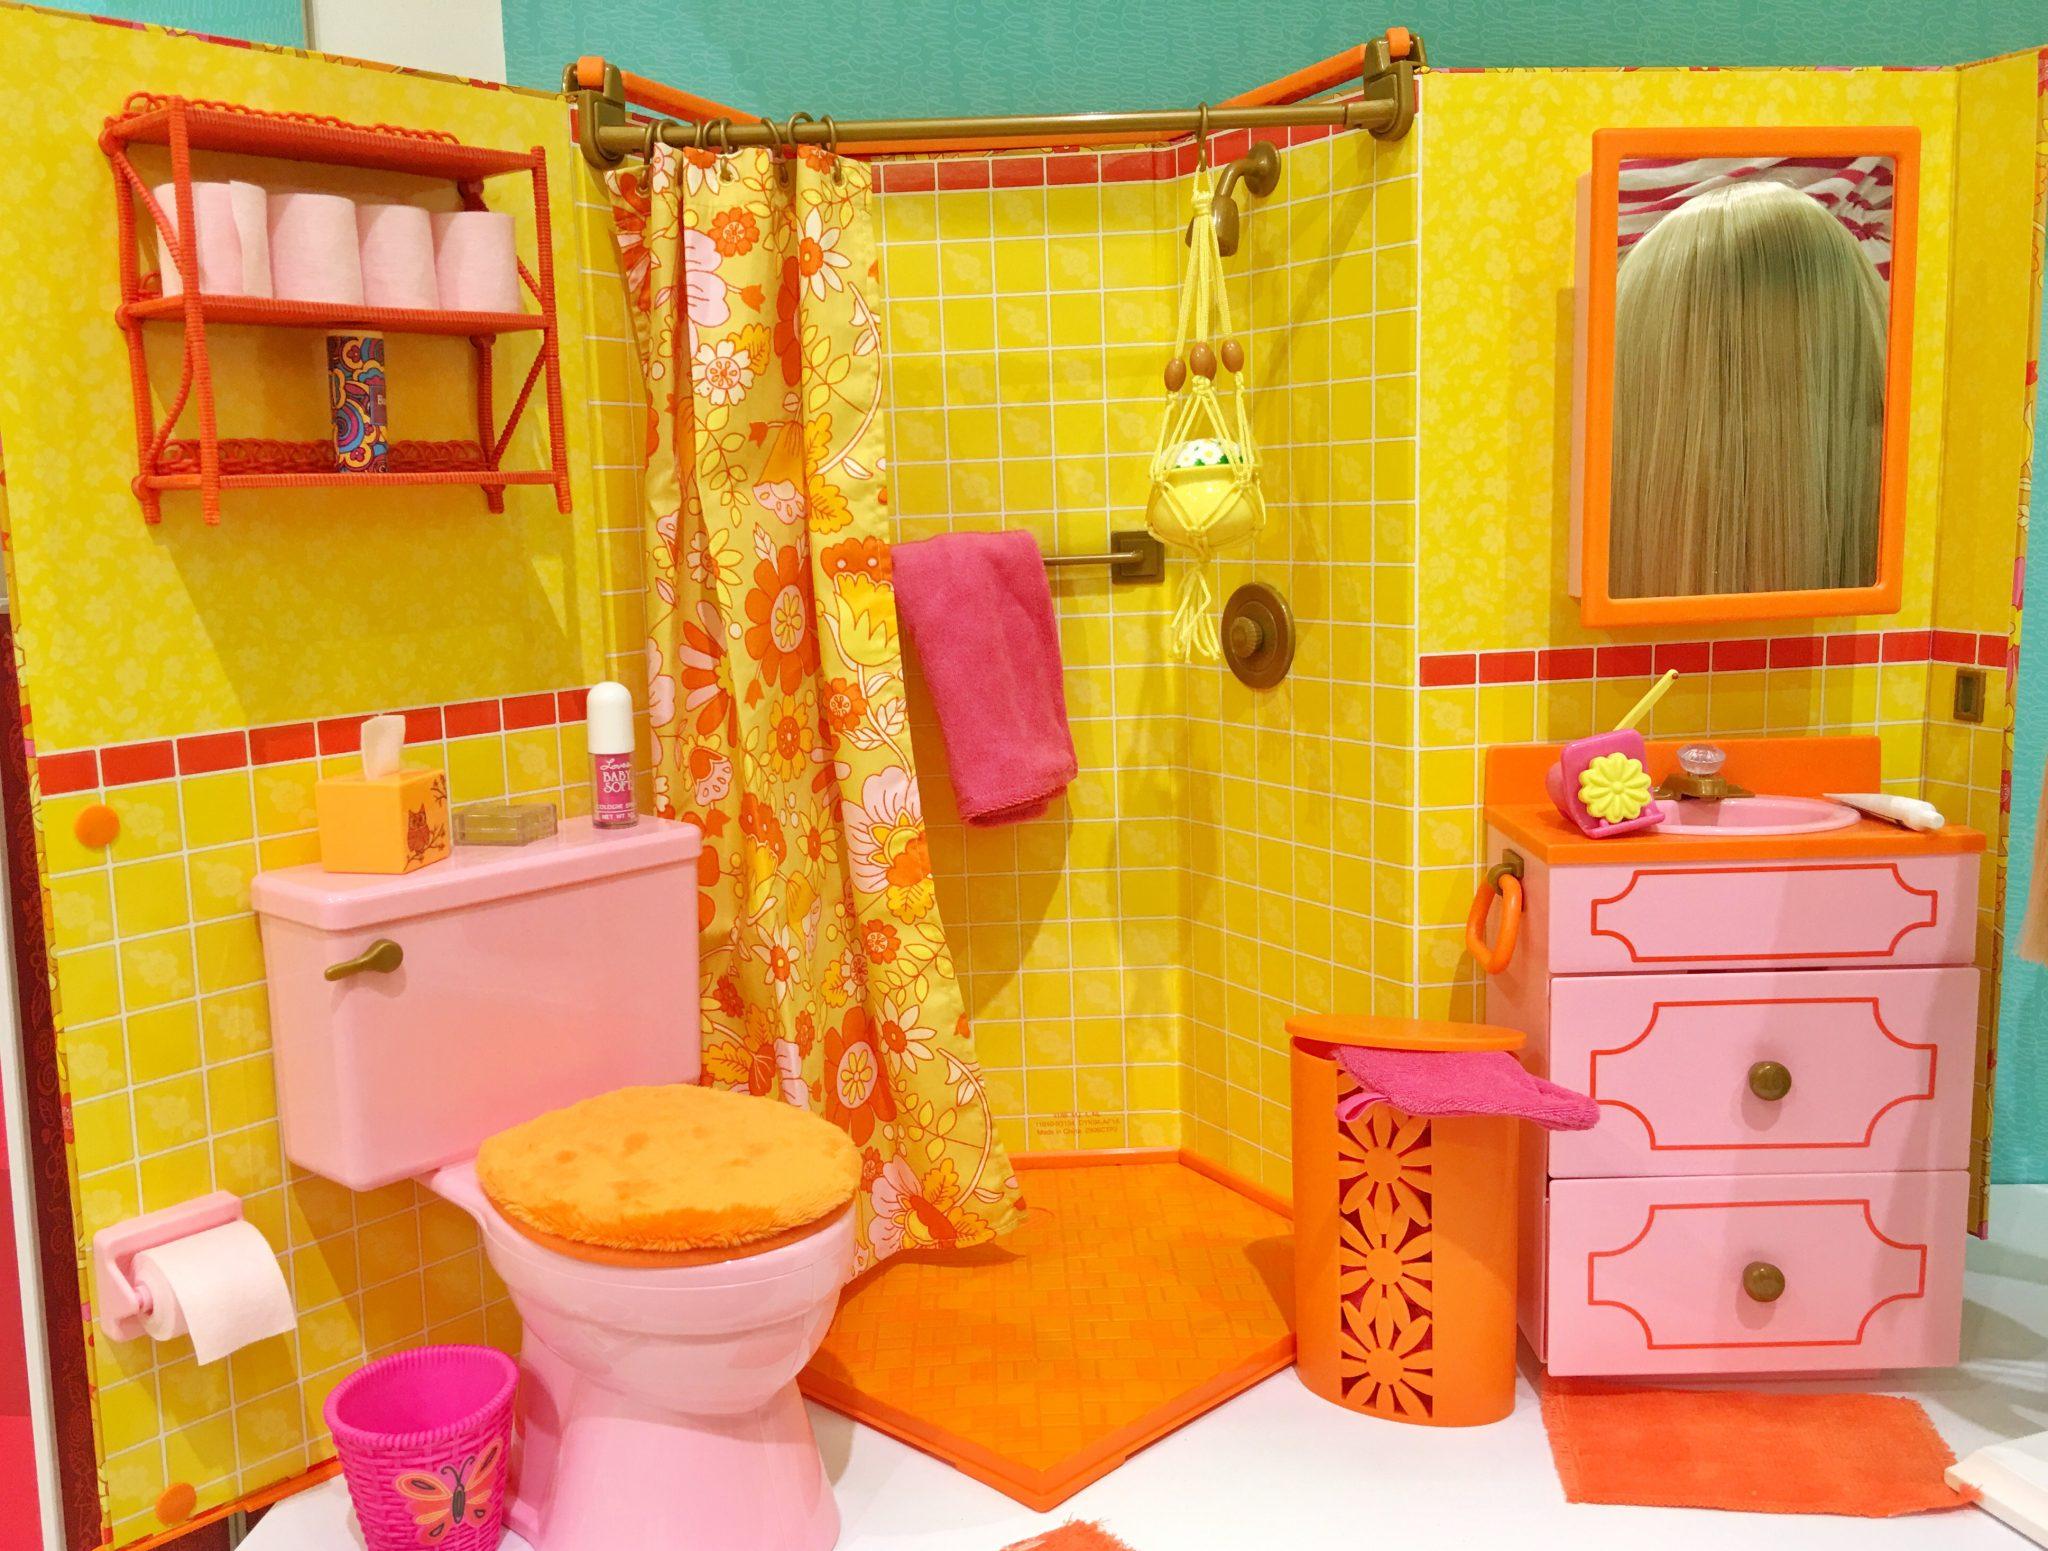 Bathroom American Girl at Washington Square Mall